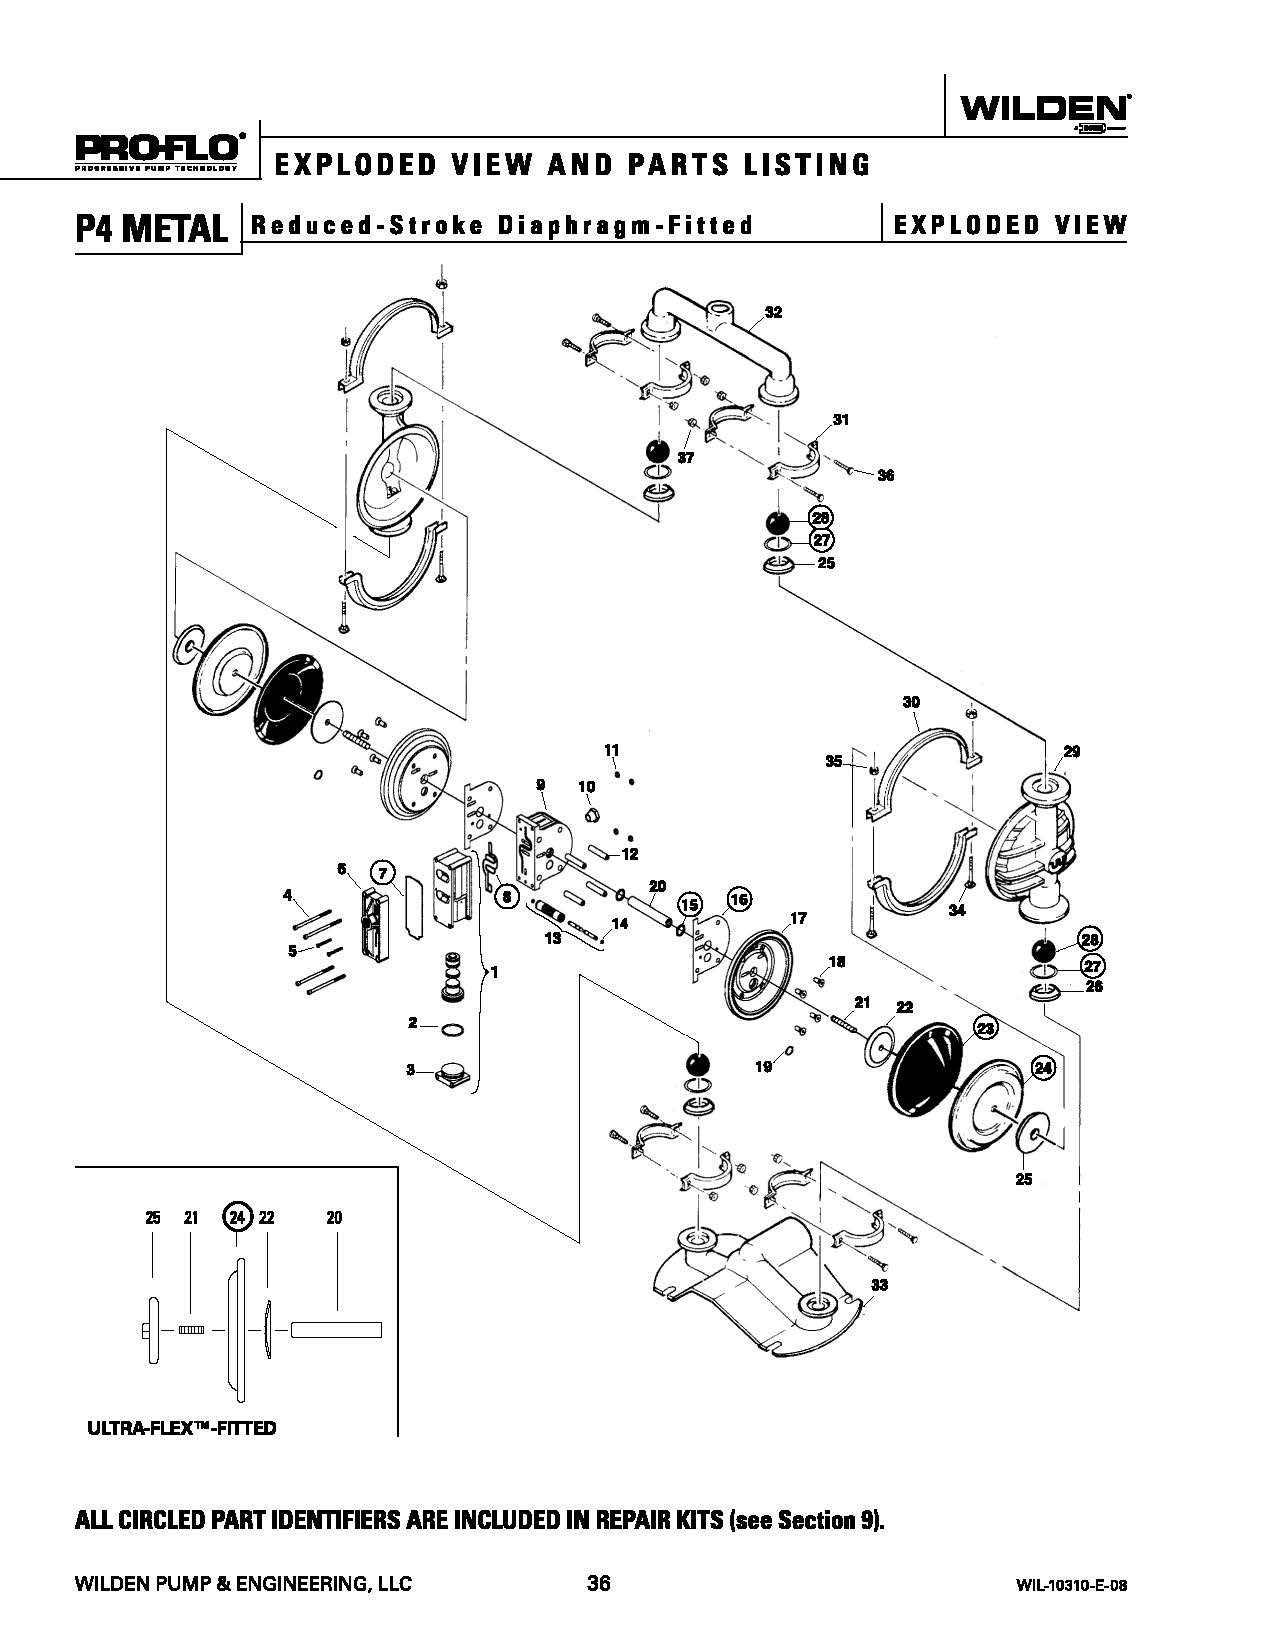 Wilden P4 Original Metal Reduced Stroke